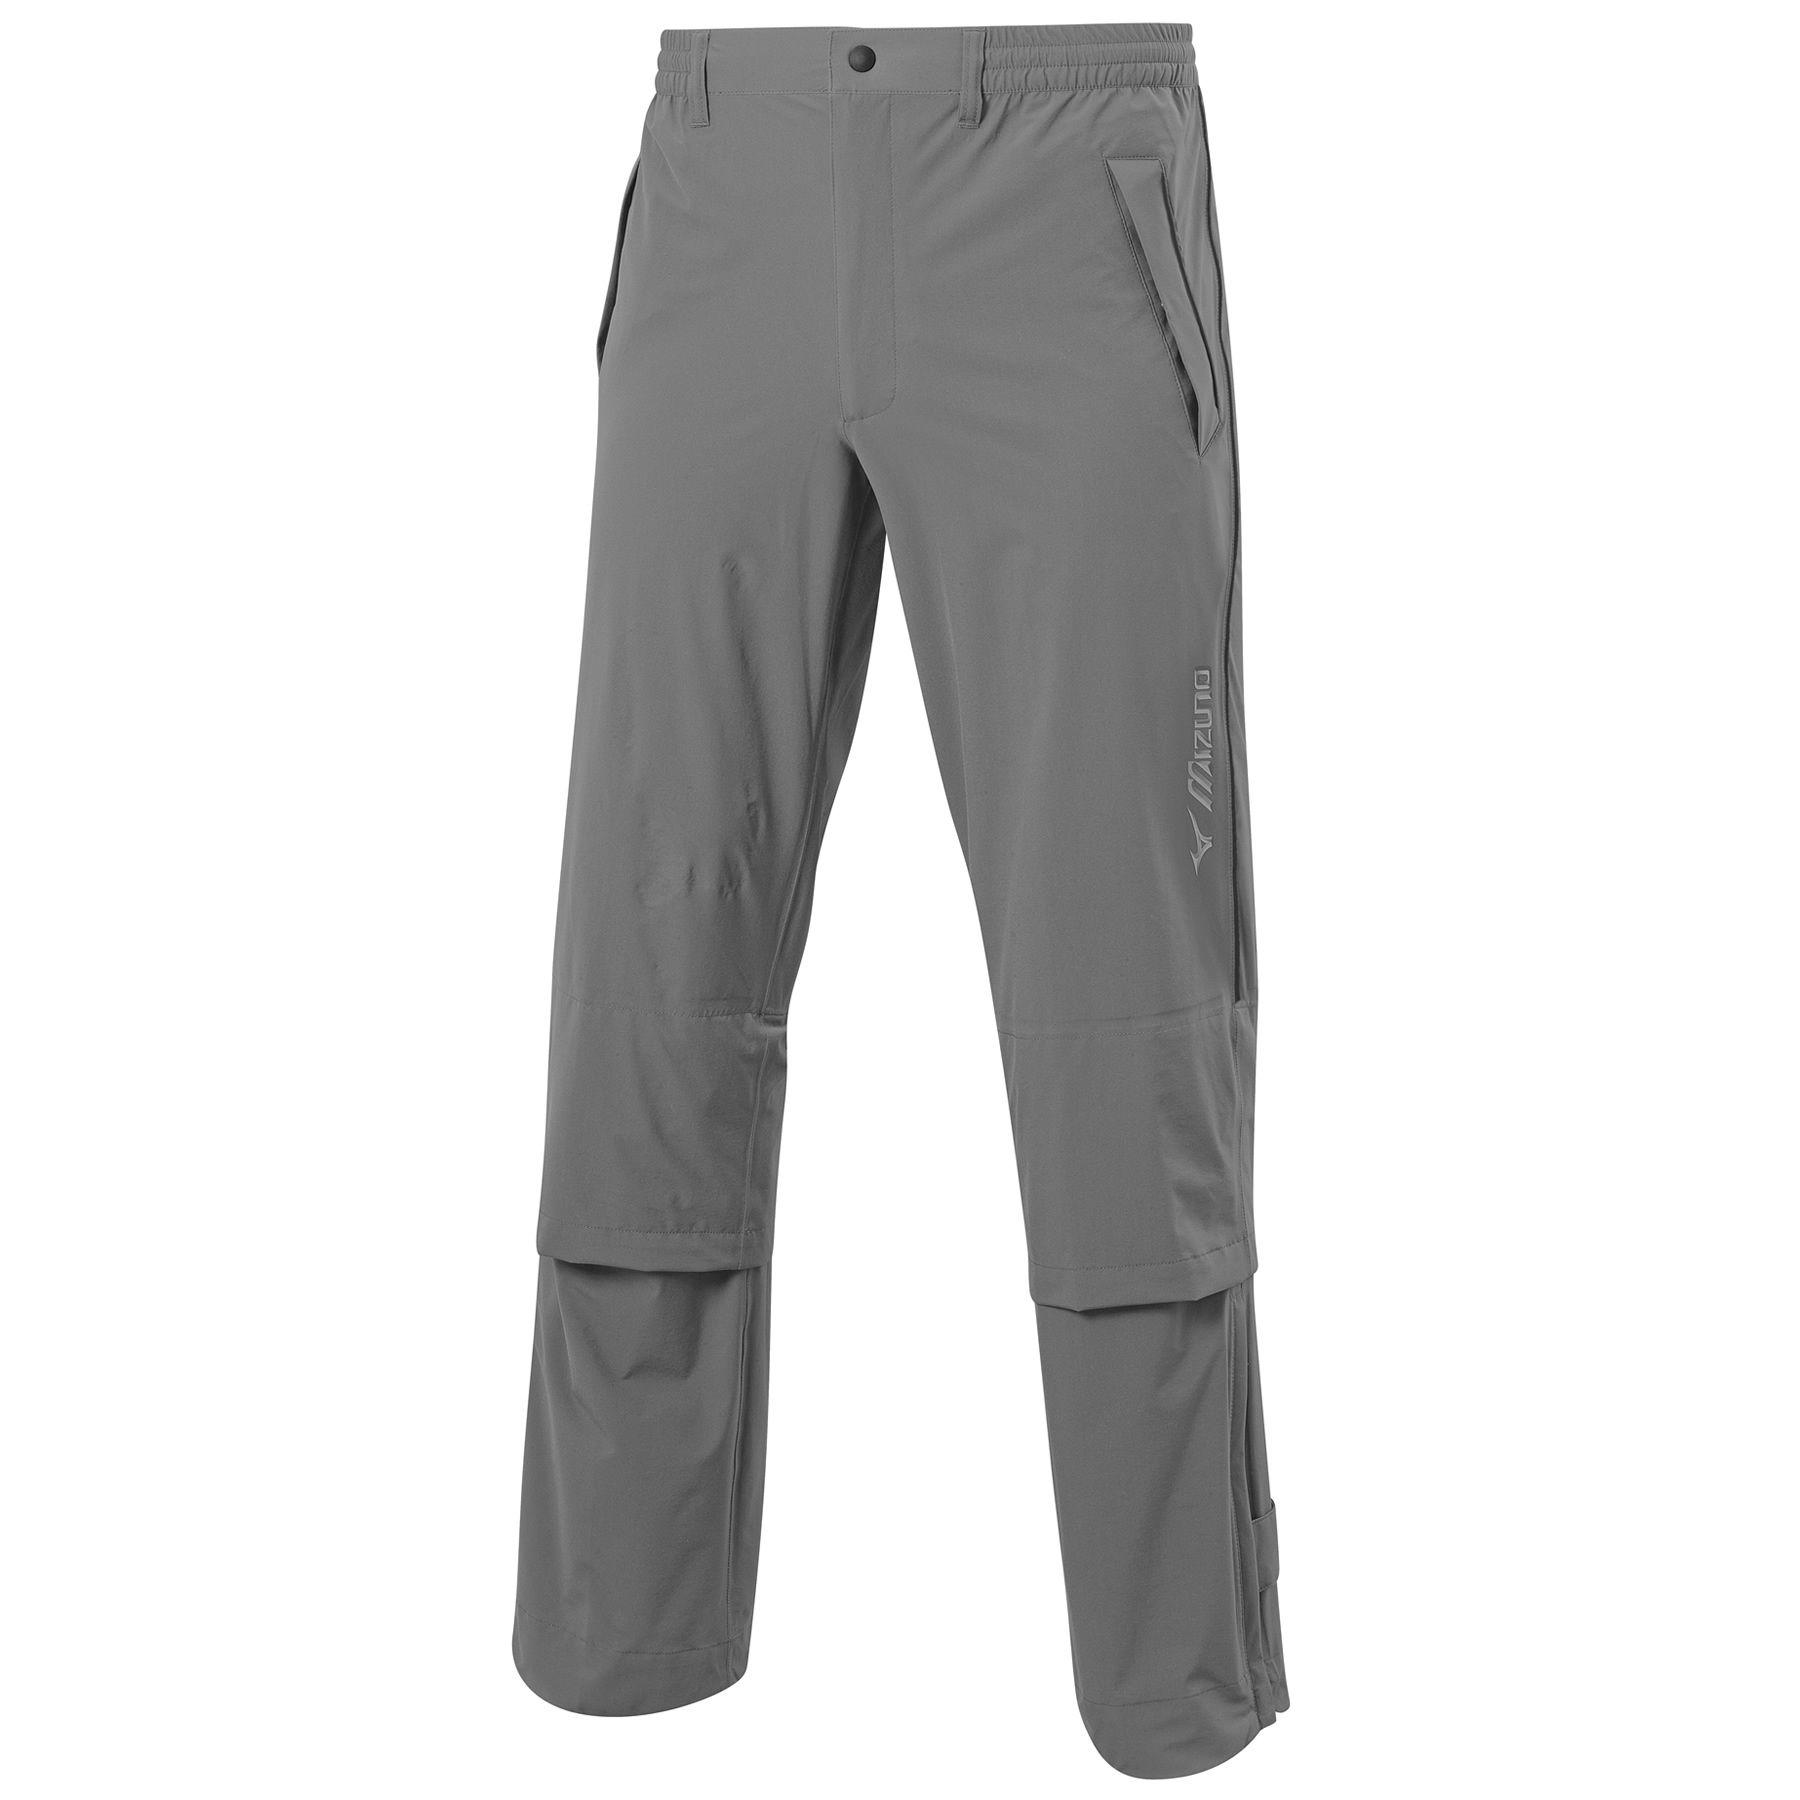 Mizuno Impermalite F20 Waterproof Golf Trousers